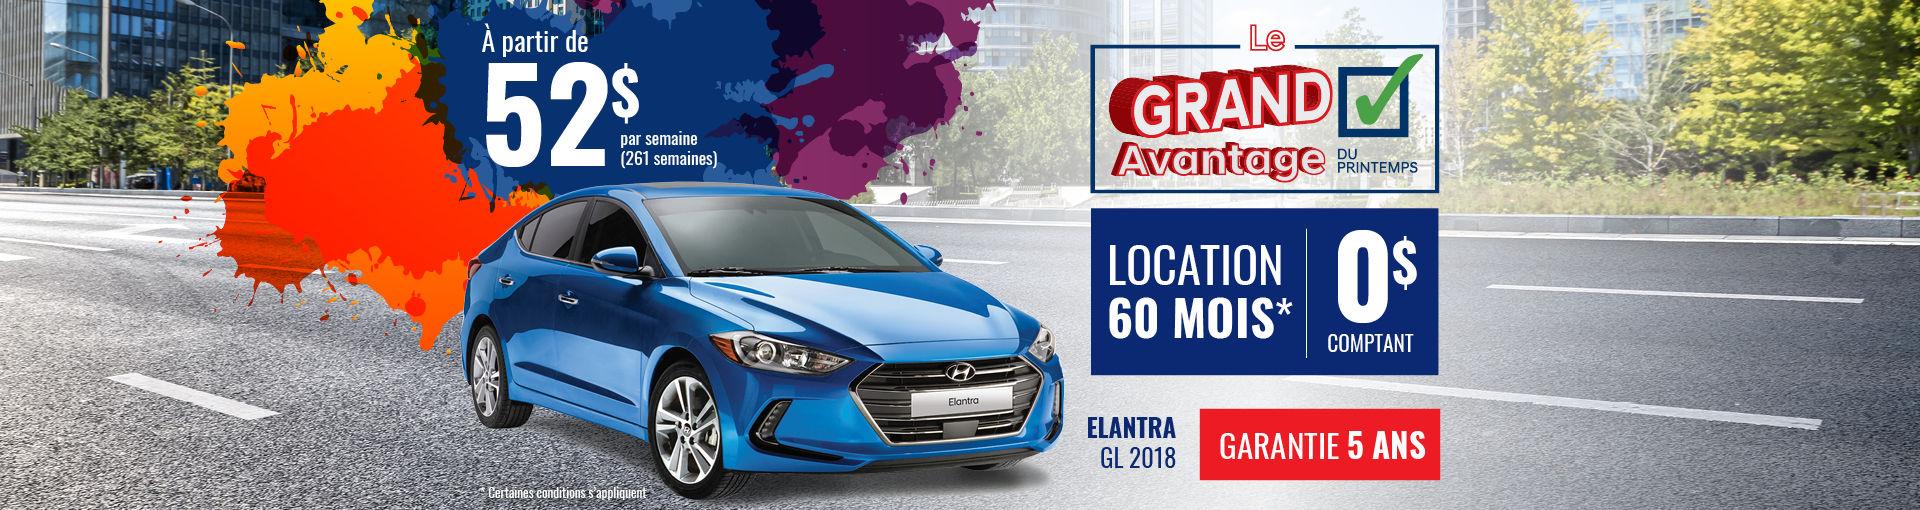 Promo Hyundai Casavant avril 2018-Elantra GL 2018